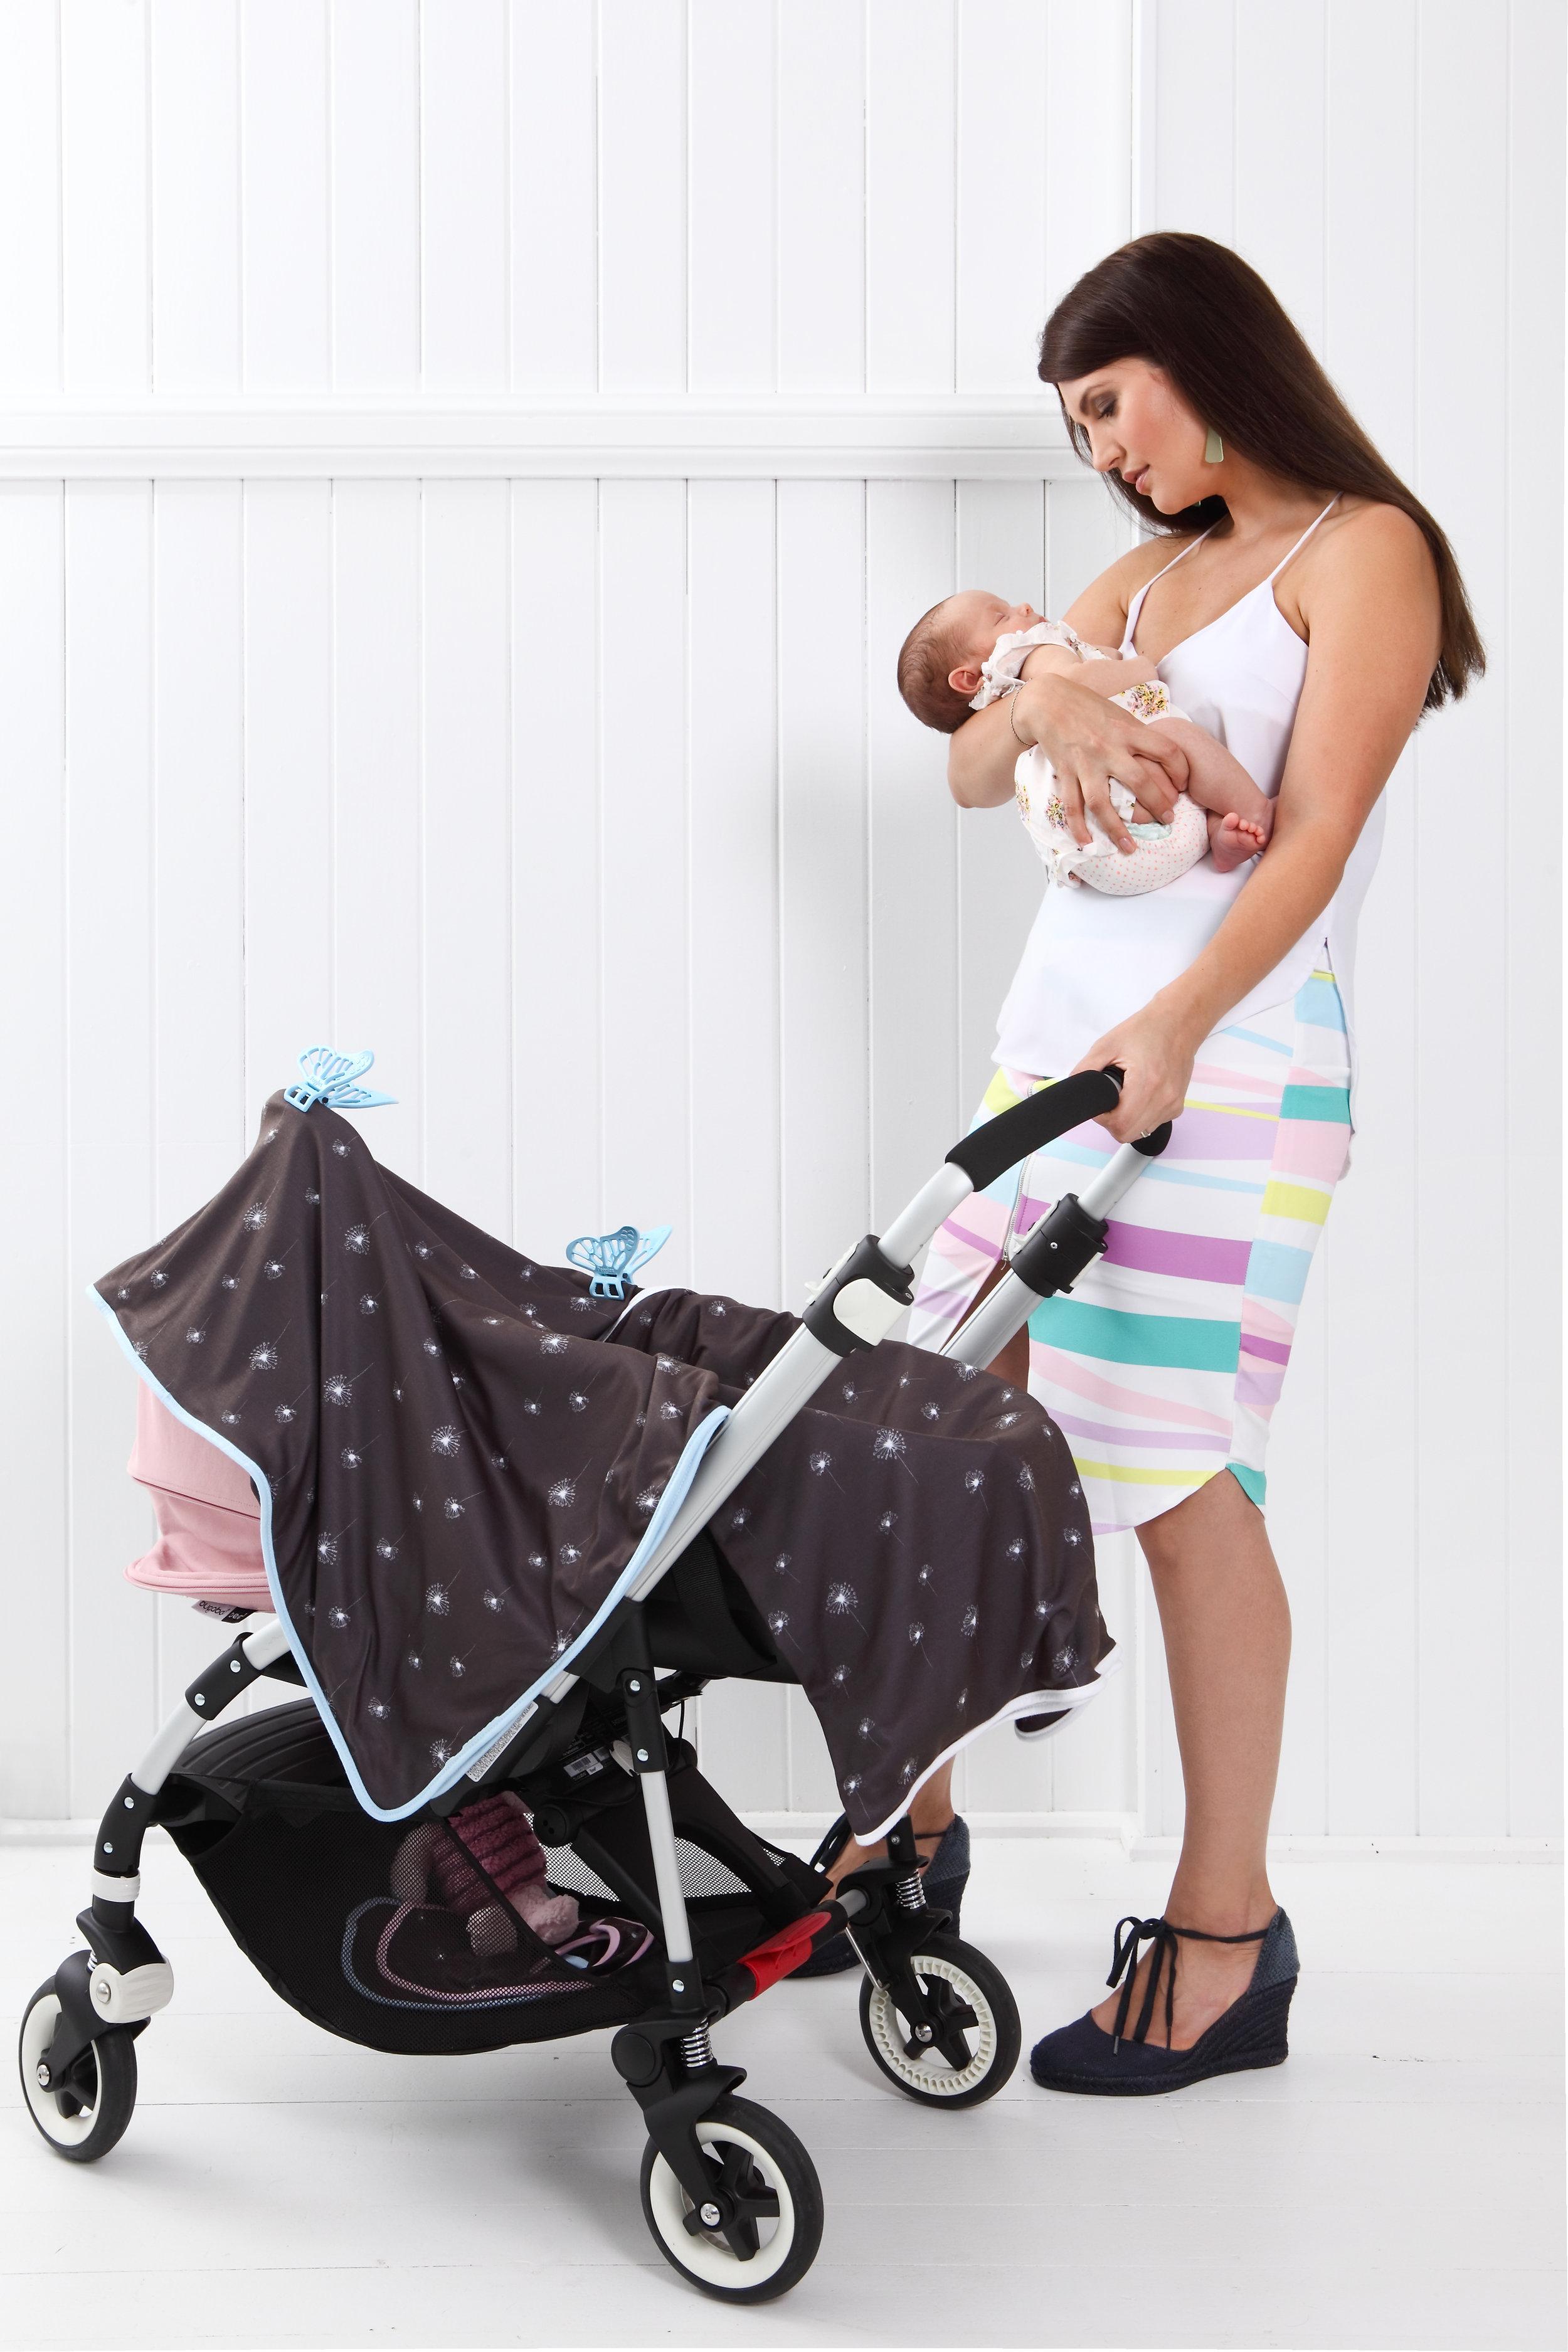 Hodge Podge Baby Campaign, Anastasia Kariofyllidis Photography